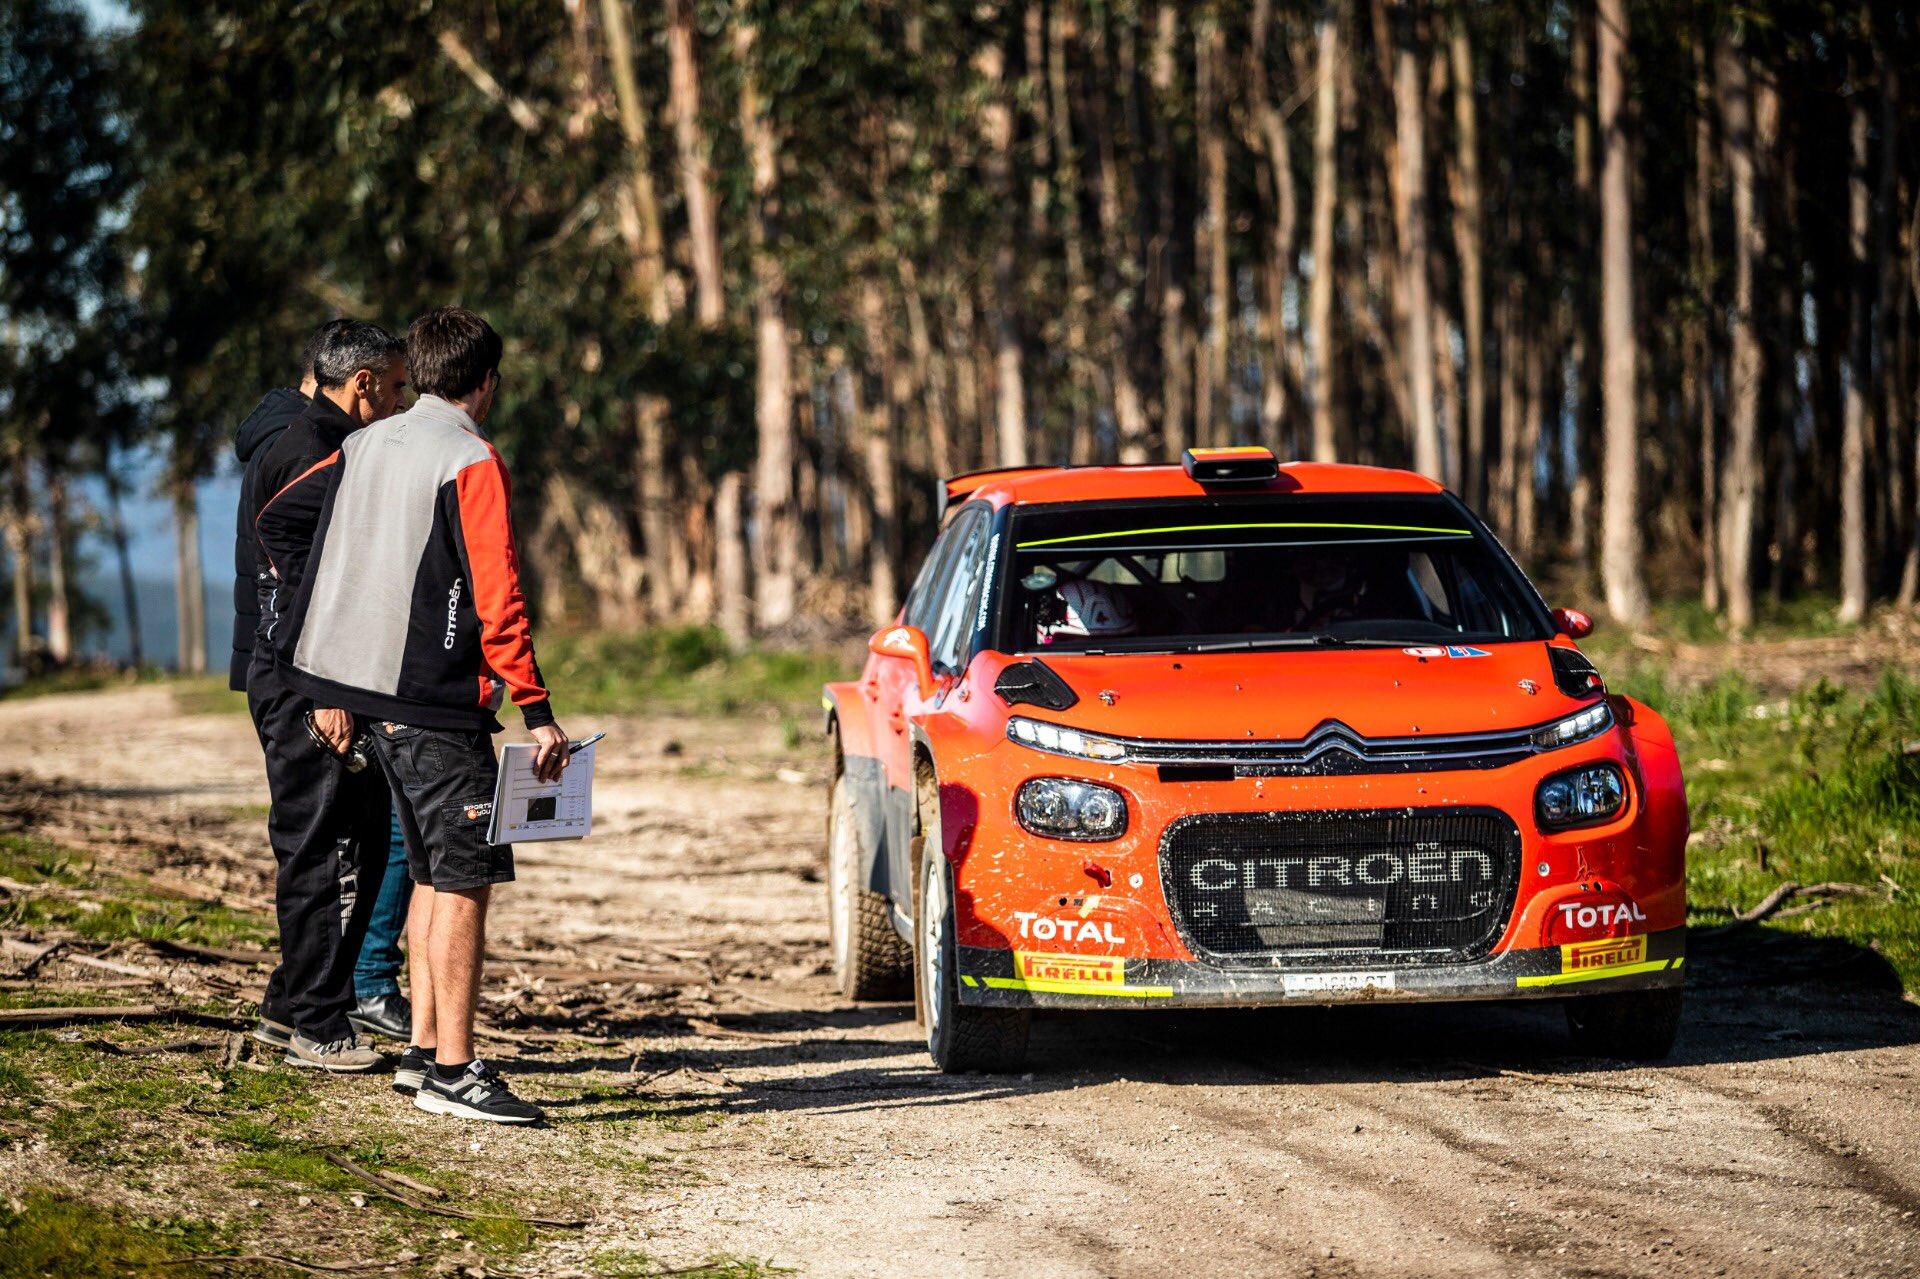 FIA European Rally Championship: Temporada 2020 - Página 4 ES1-pBpWoAIZyP_?format=jpg&name=large